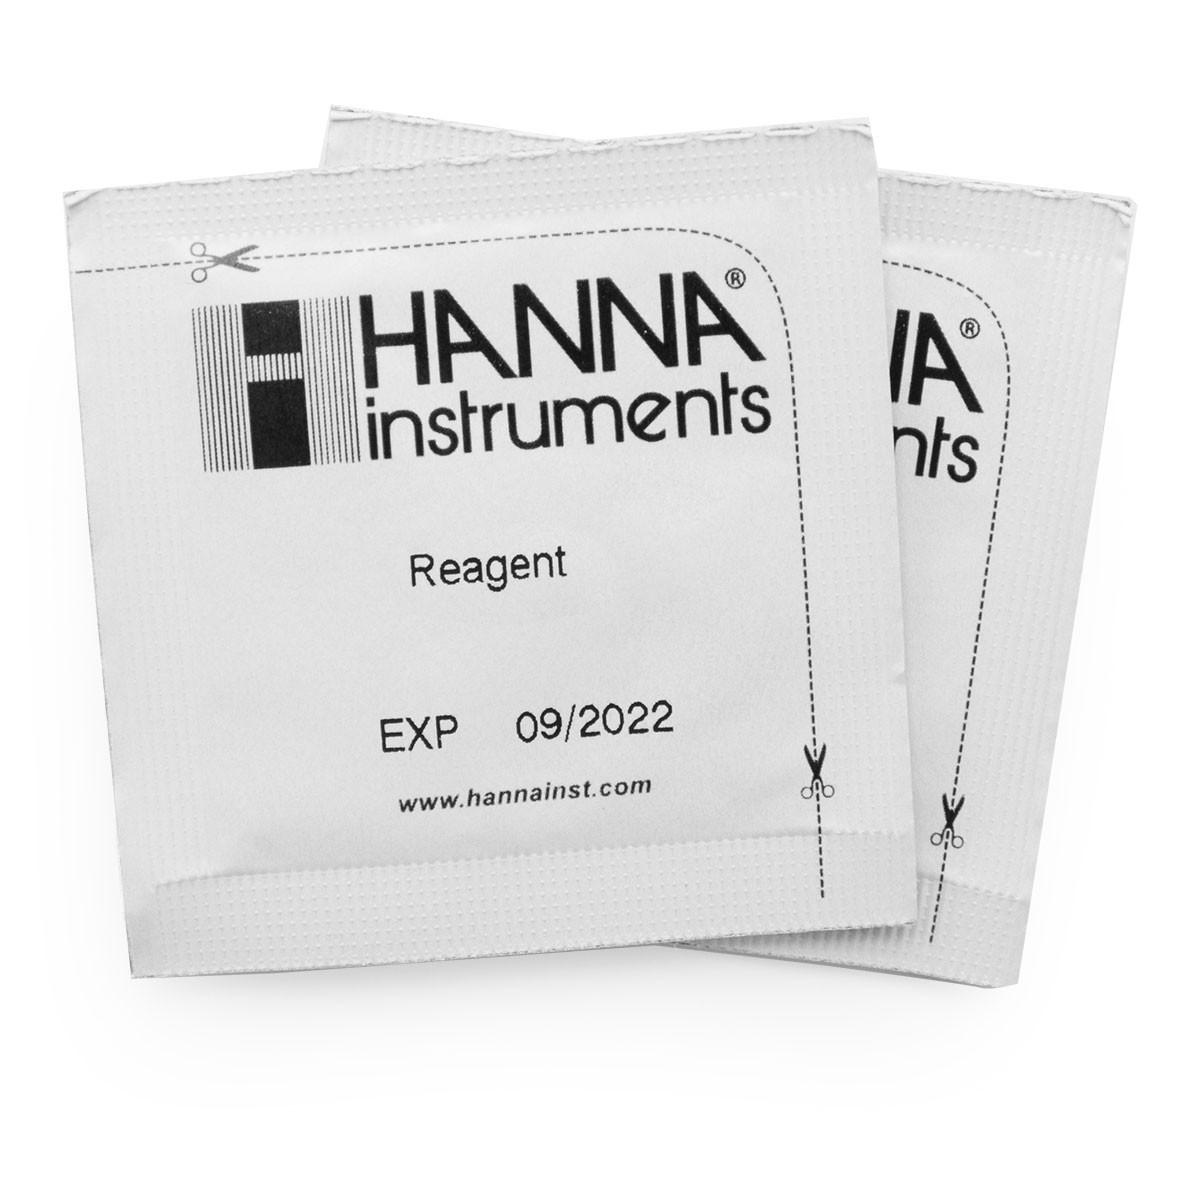 Chromium VI Low Range Reagents (100 tests)